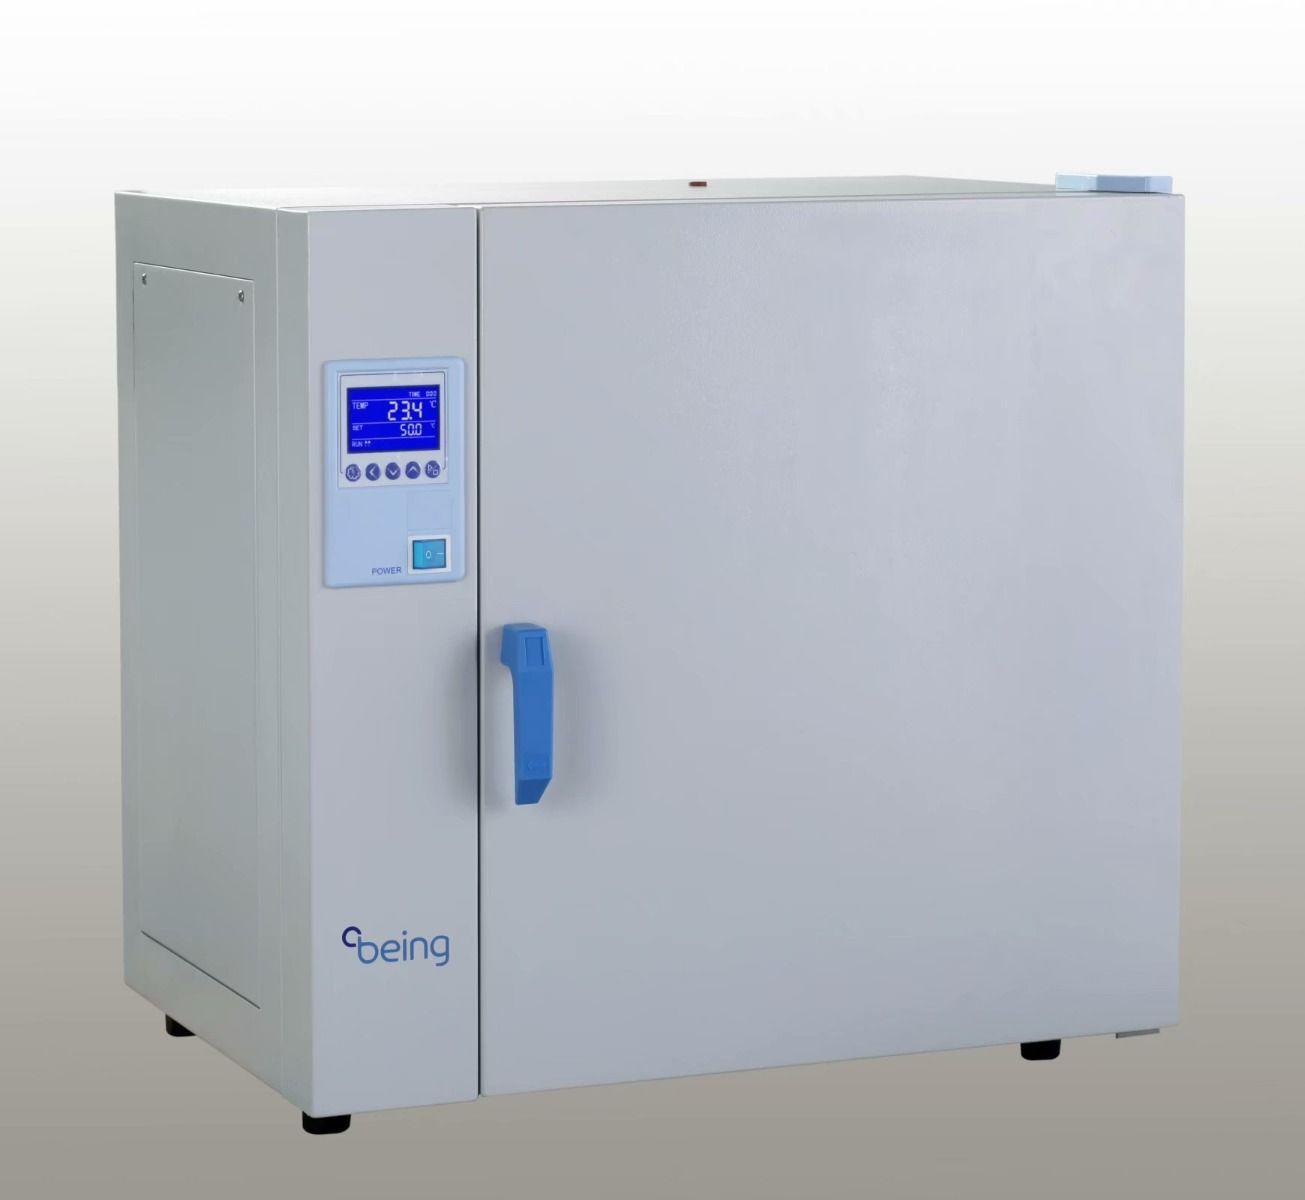 BIT-55 BEING Incubator, amb.+5℃-80℃, 60 liters